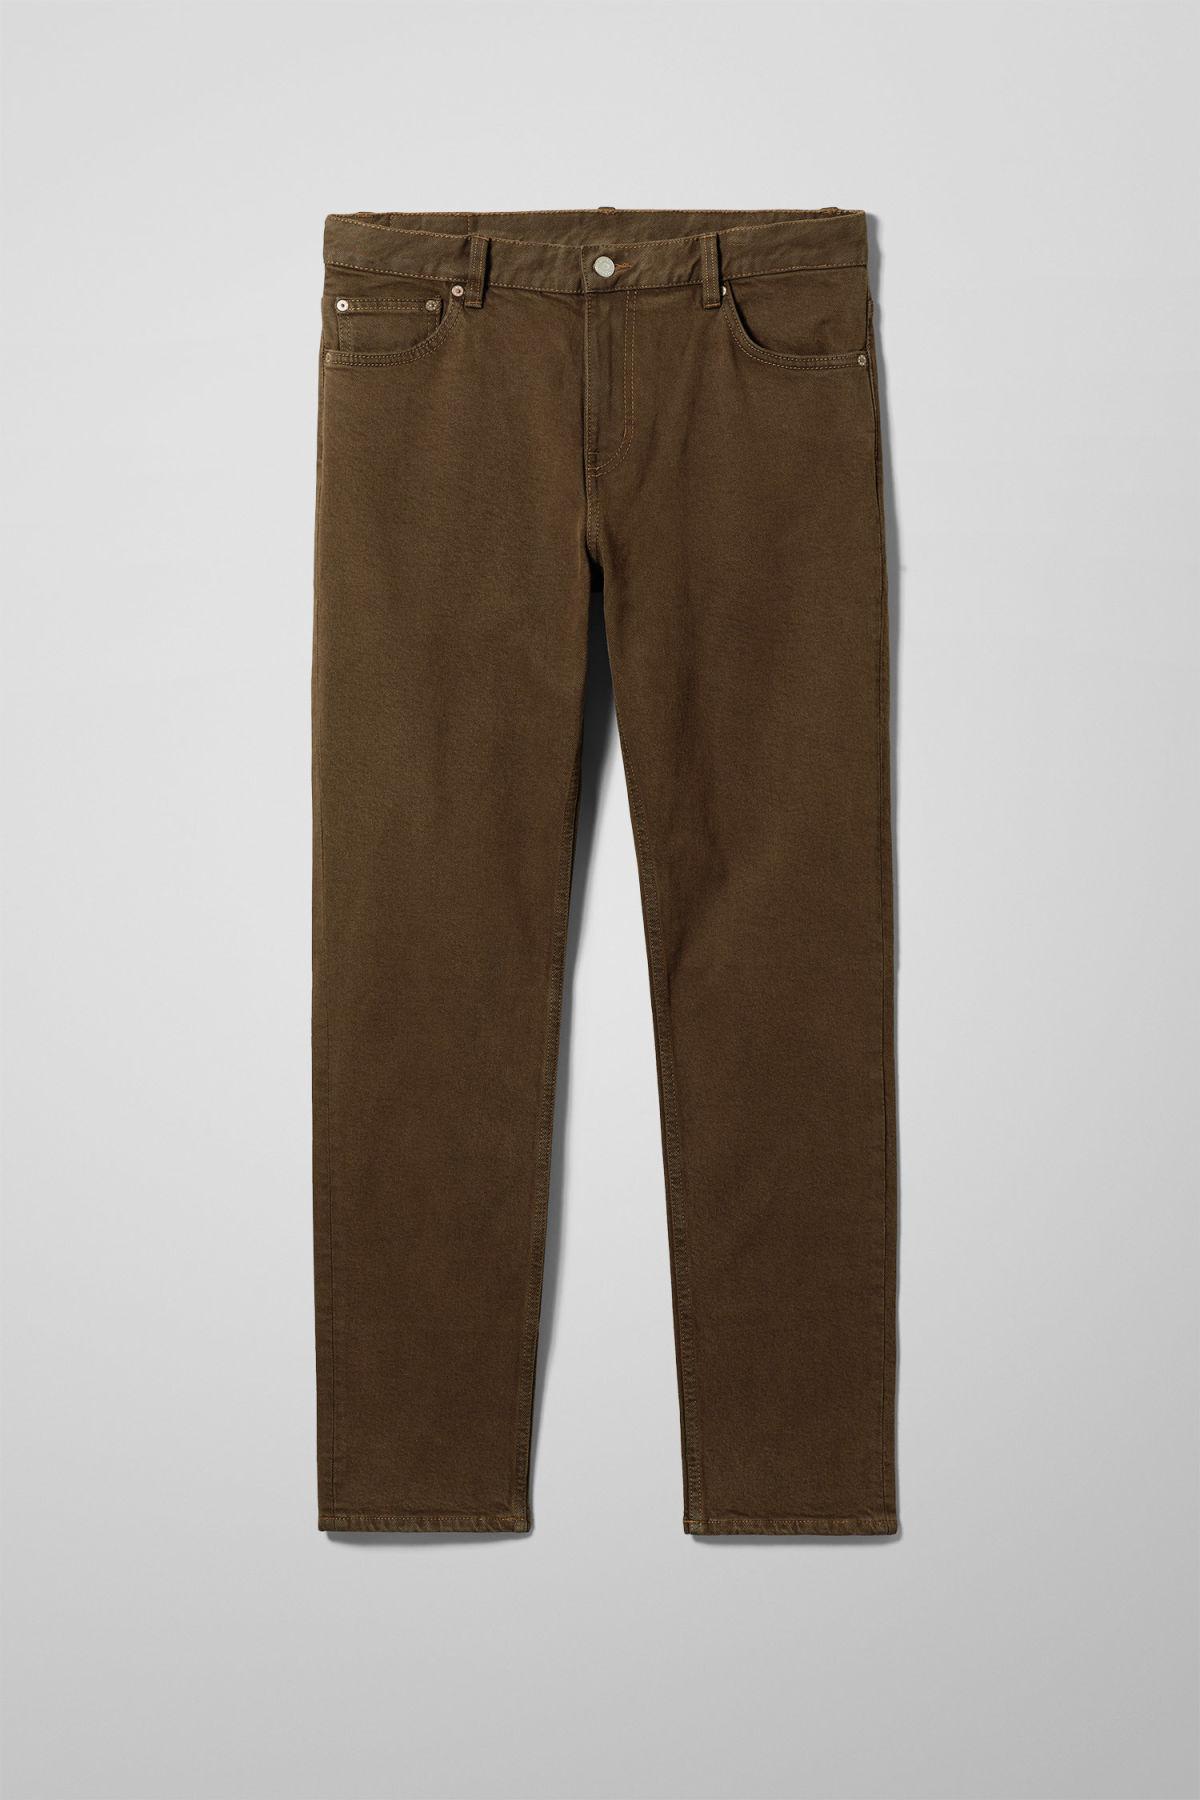 Sunday Slim Jeans - Beige